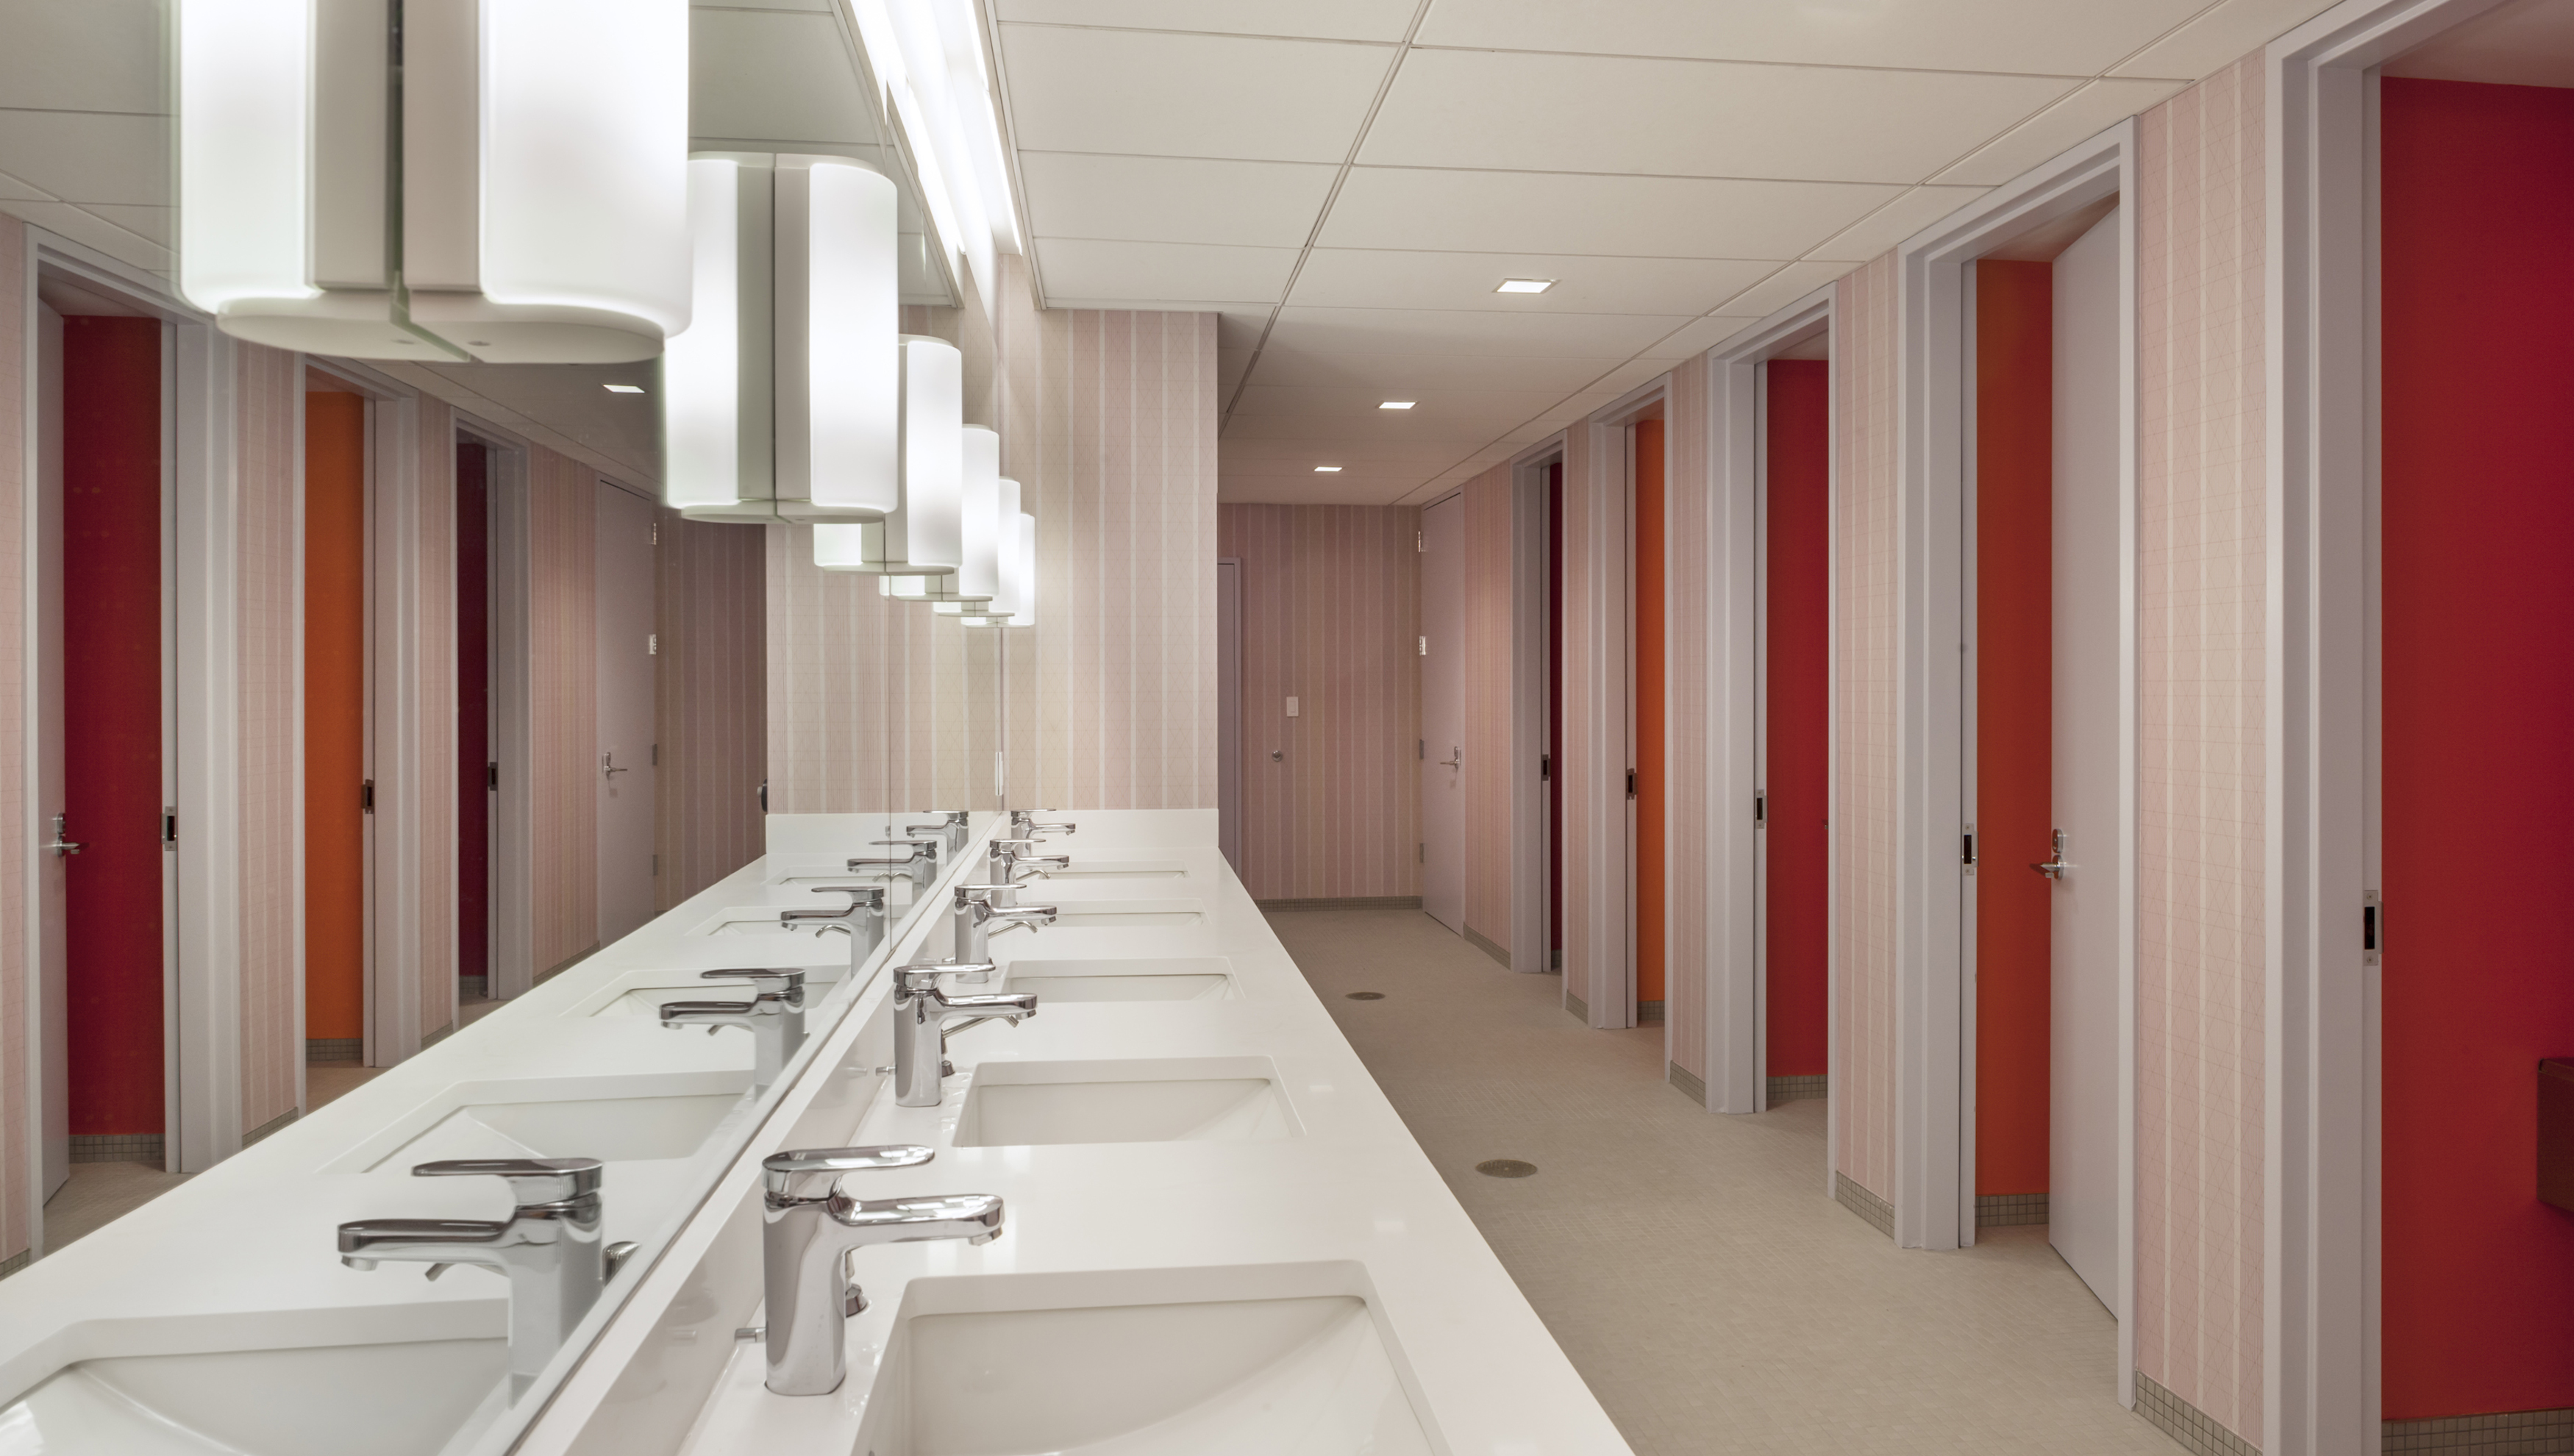 How To Design Transgender Friendly Bathrooms That Make